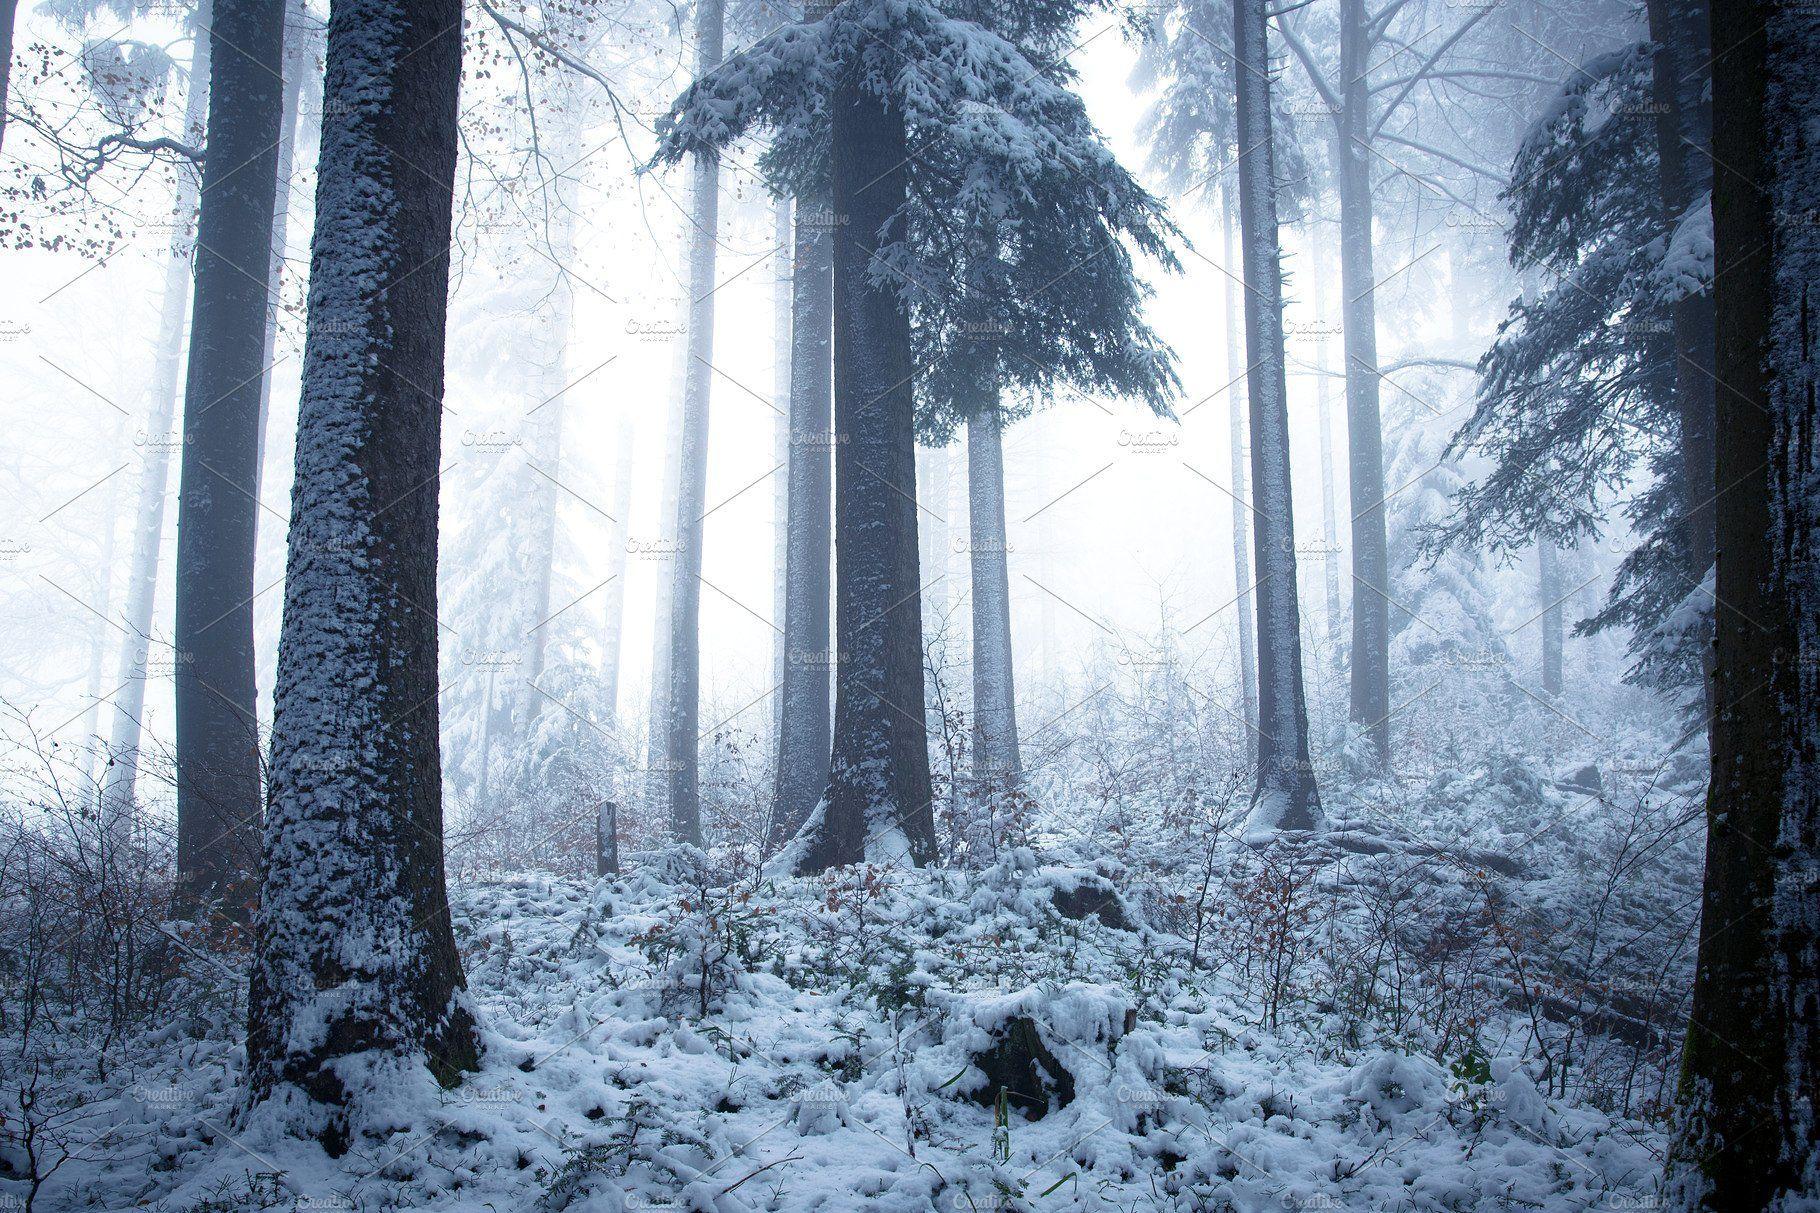 Winter Forest Winter Forest Forest Art Forest